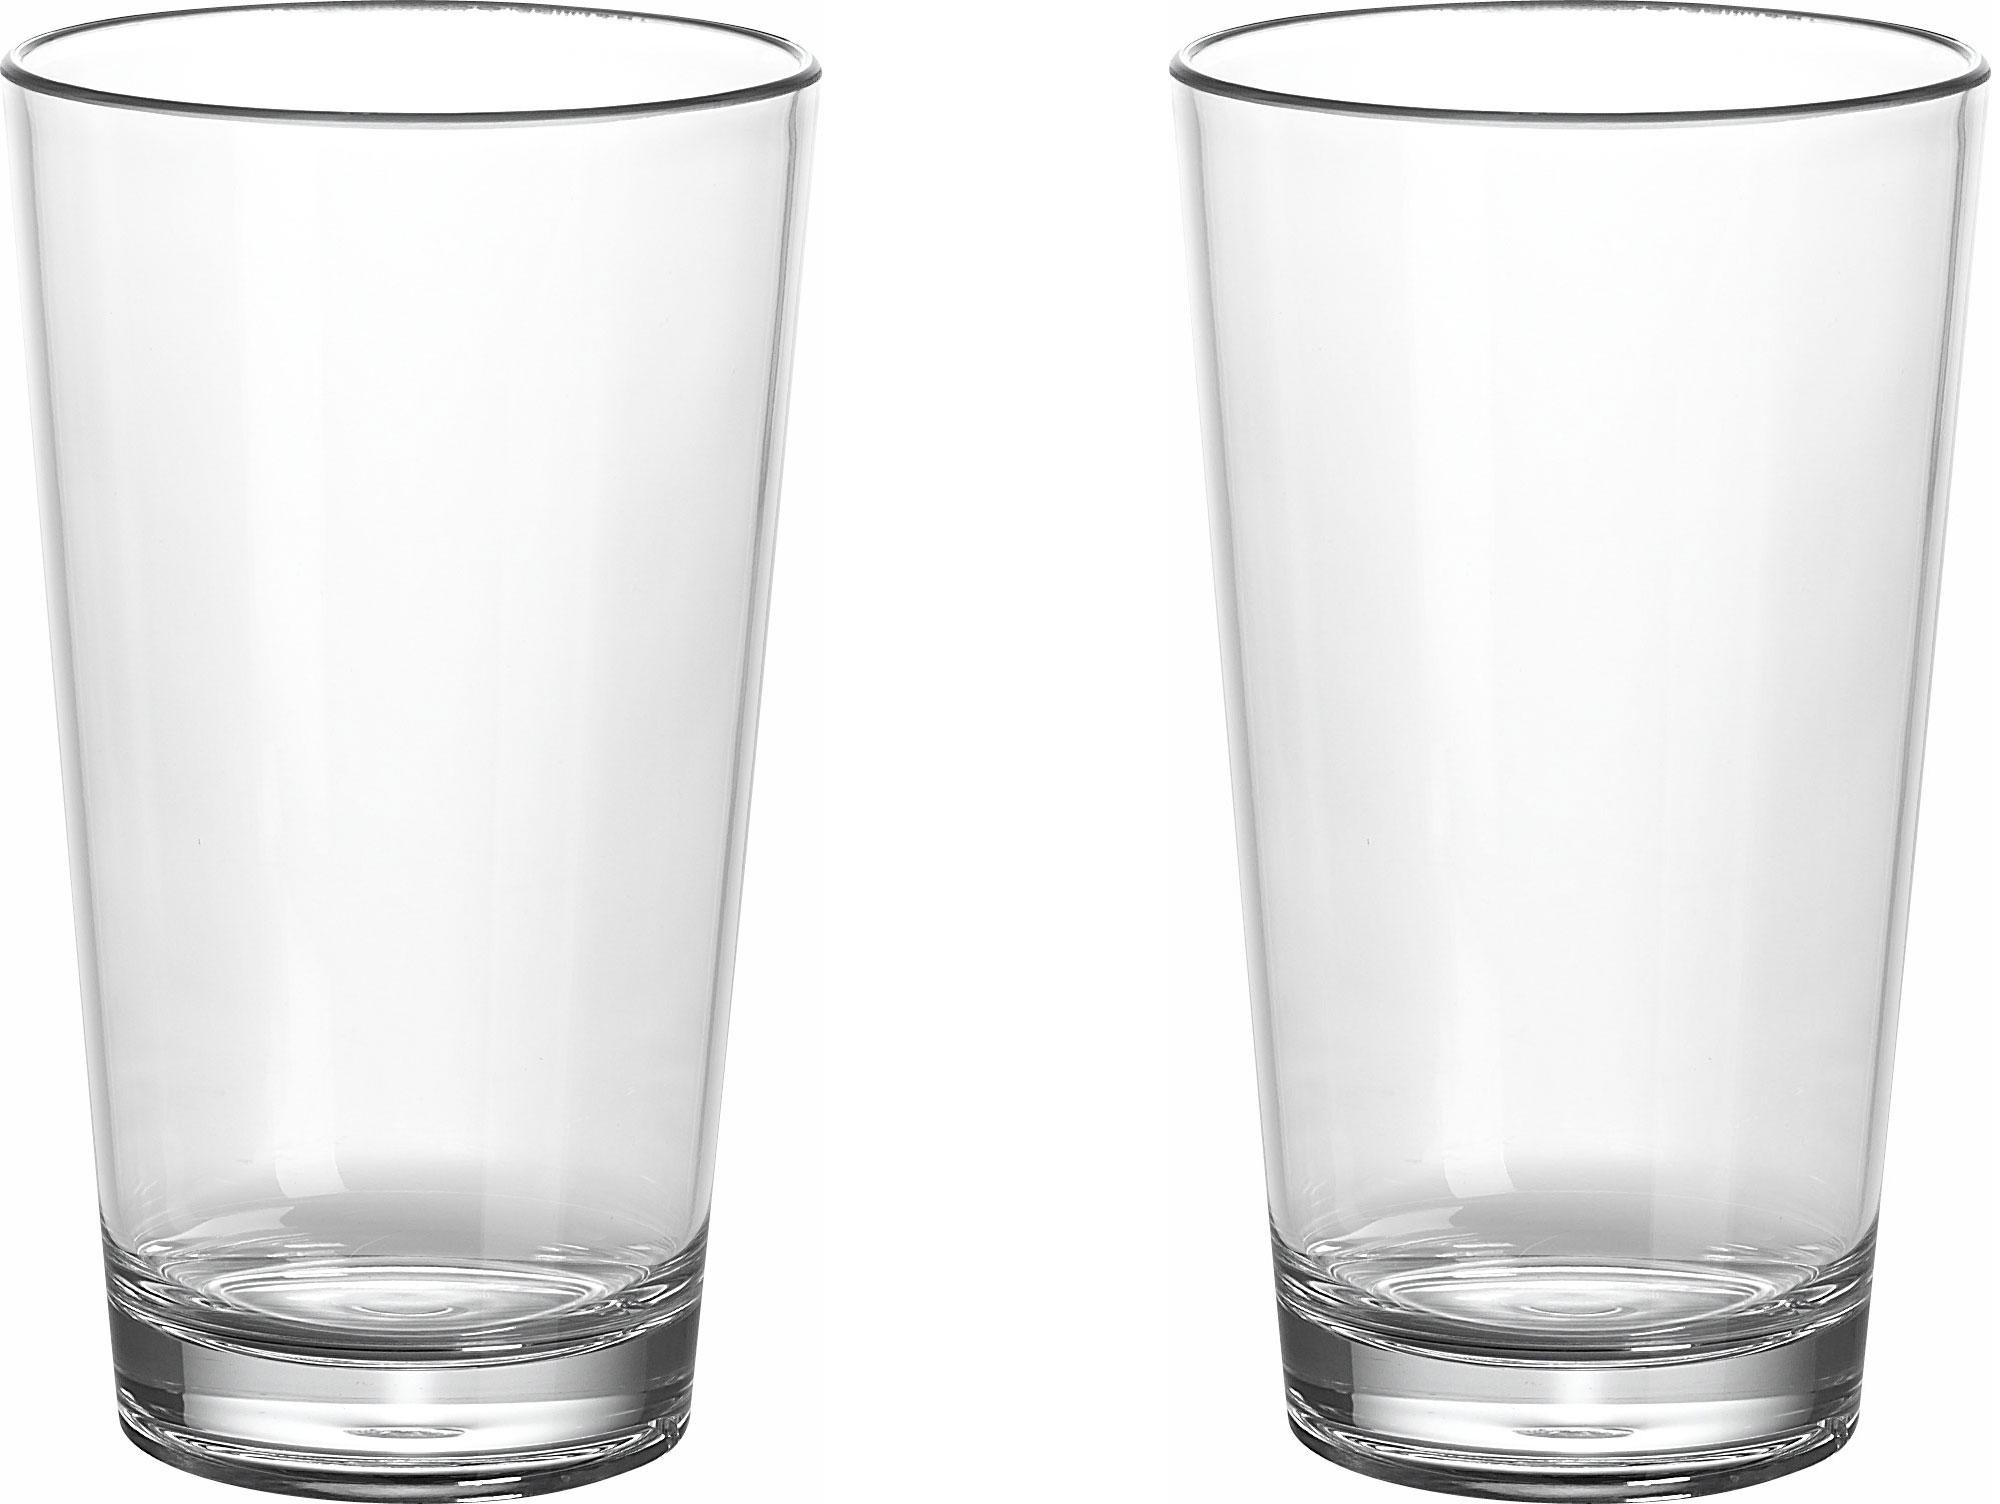 Gimex Kunststoff Latte Macchiato Gläser 0,35 l 2er Set